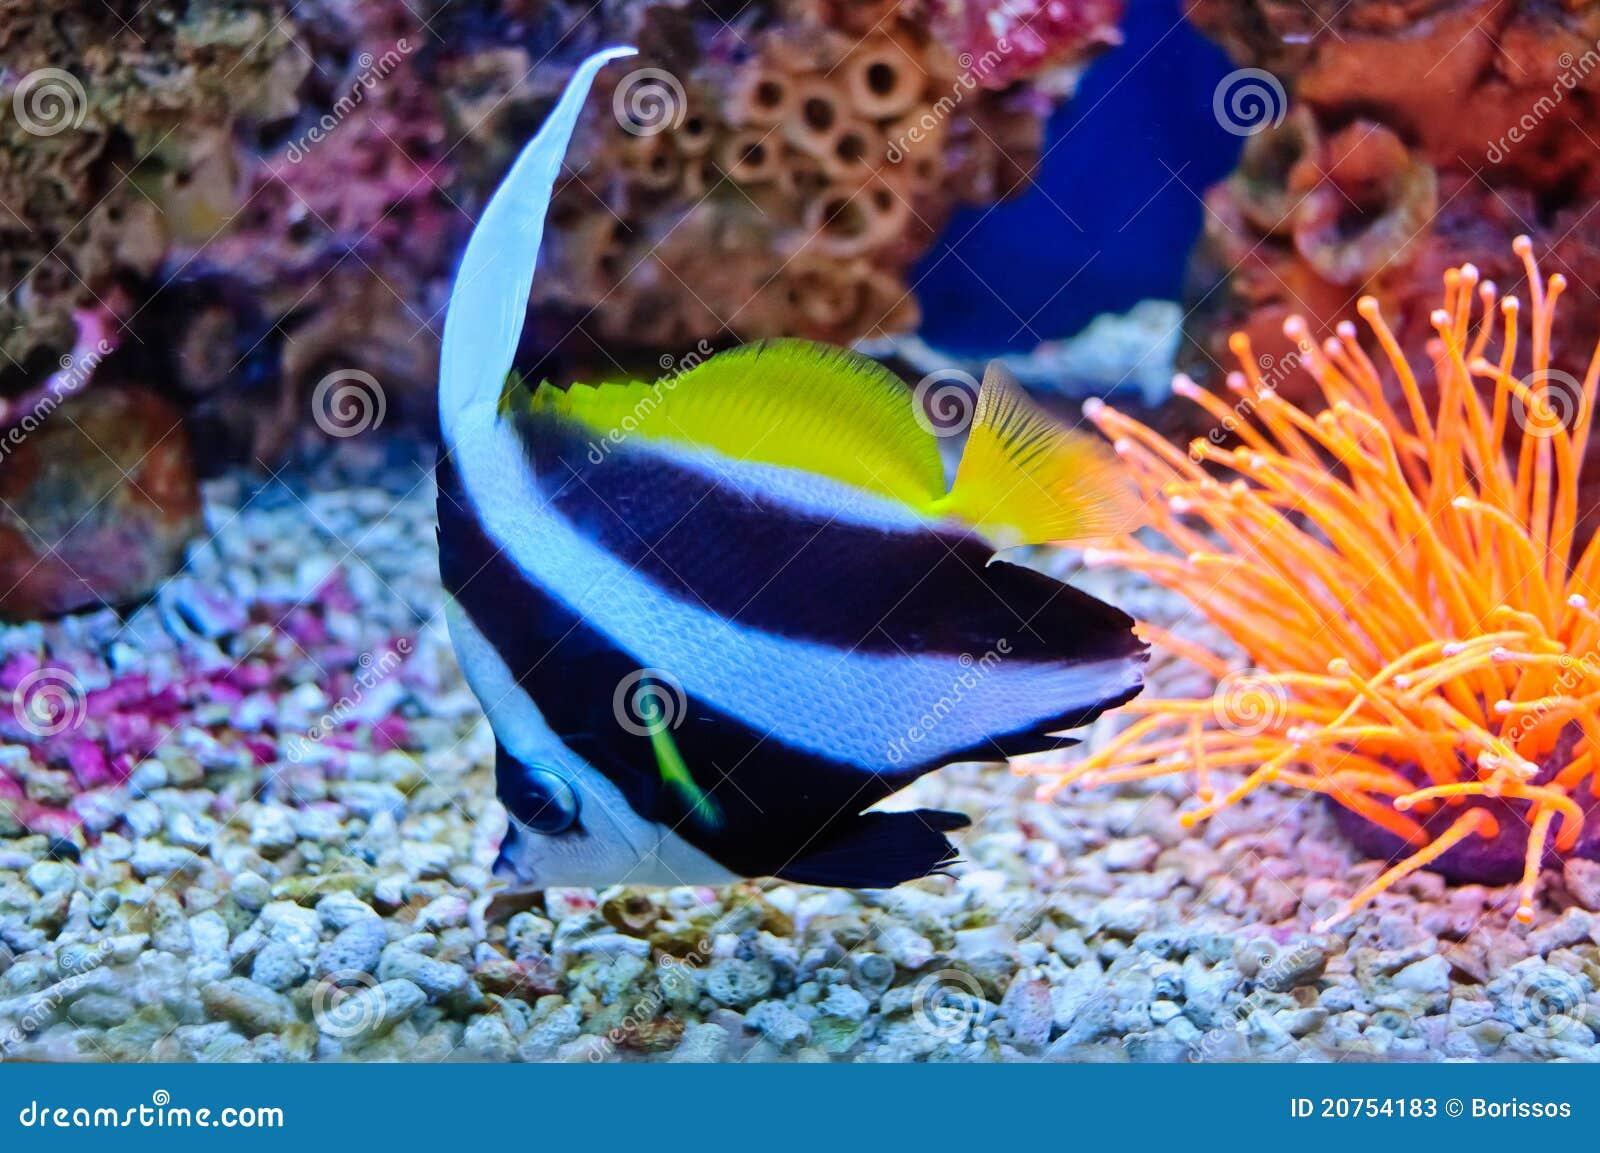 Poissons tropicaux marins image stock image du bleu for Sfondi pesci tropicali